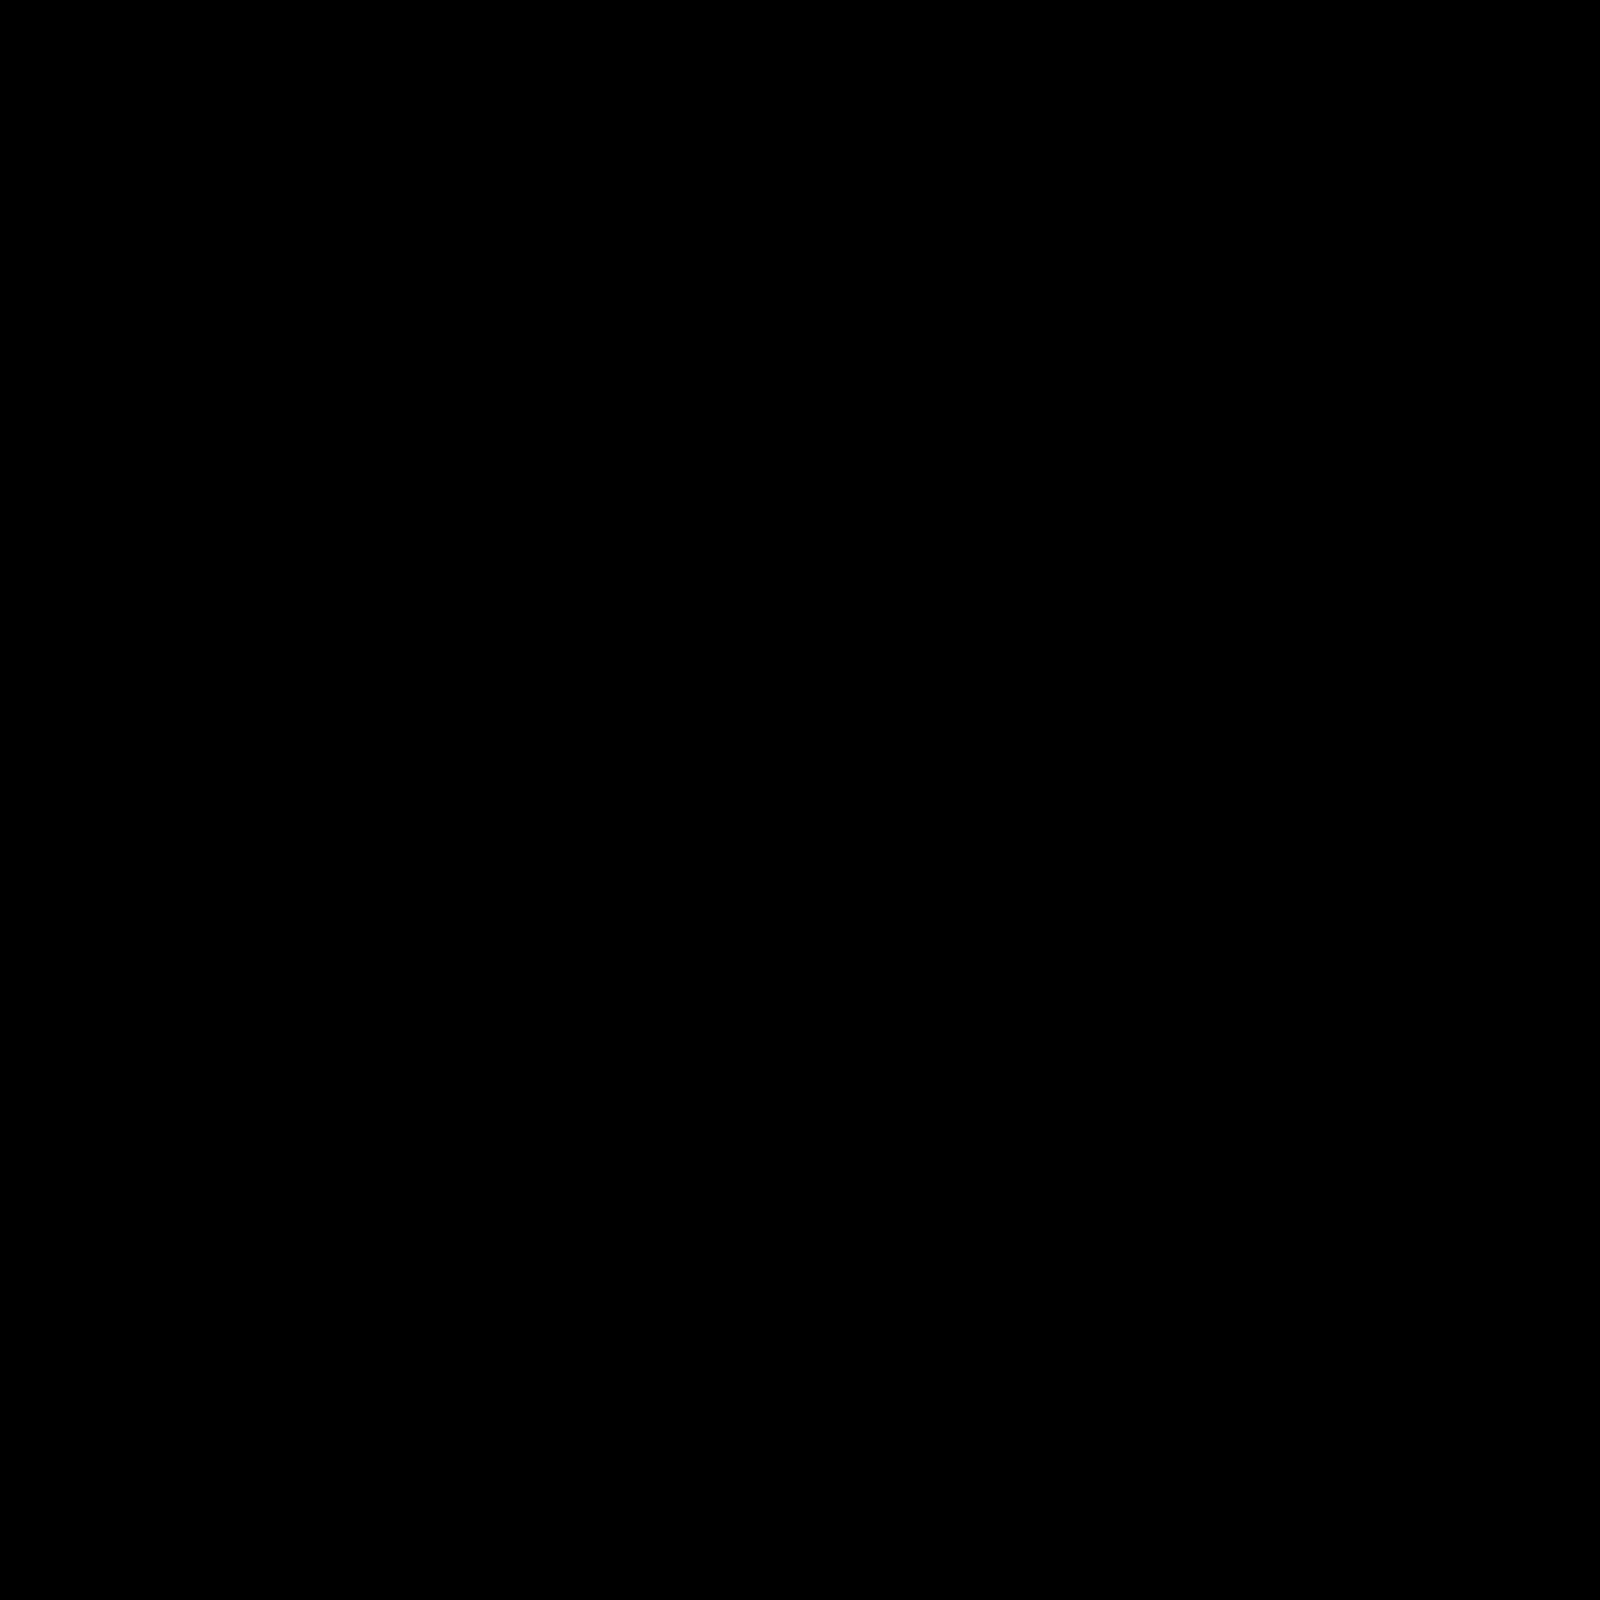 Gingerbread house icing template clipart banner transparent stock Gingerbread House Filled ícones - Download Gratuito em PNG e SVG banner transparent stock